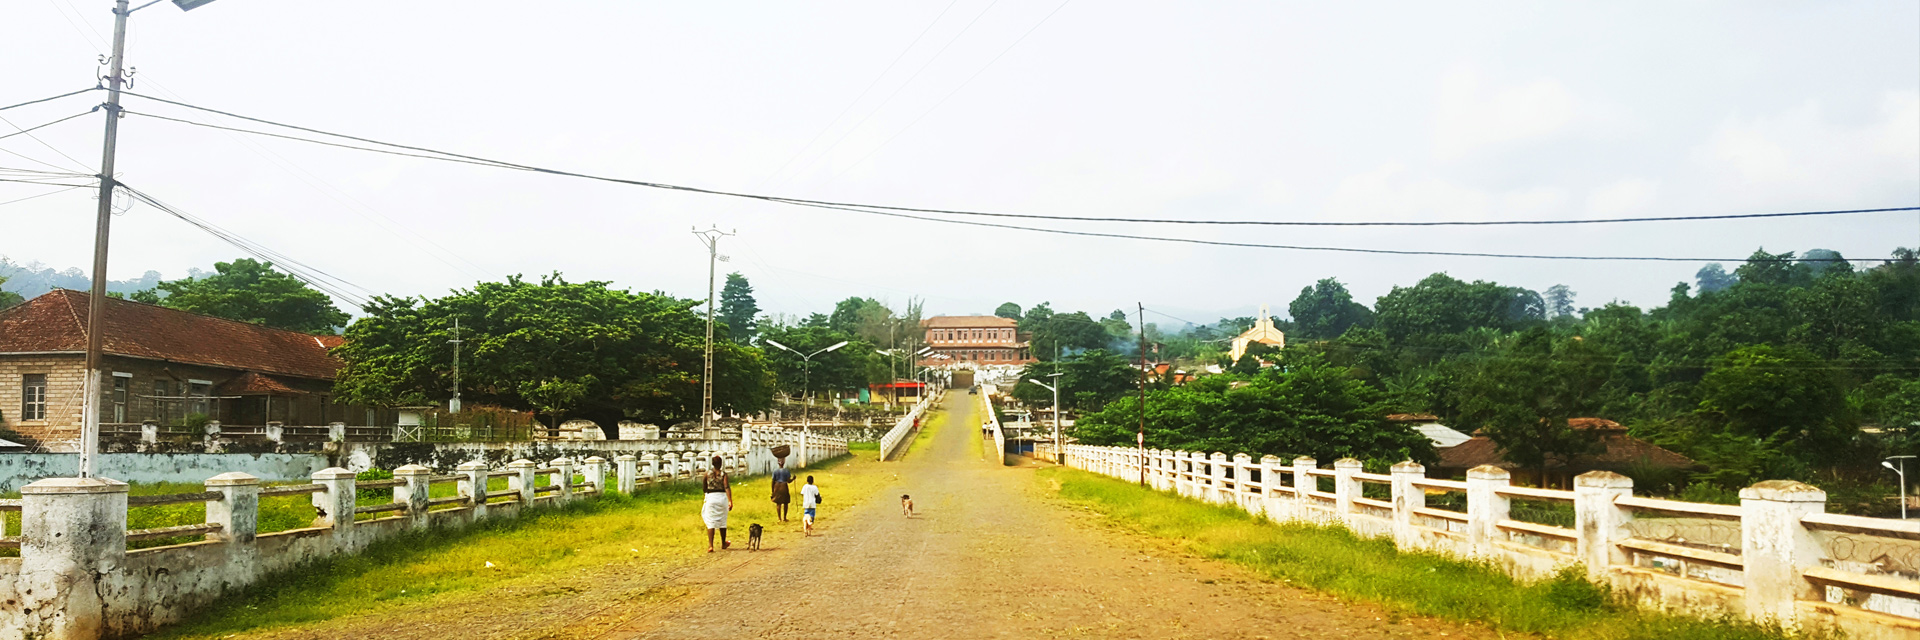 Excursions center area